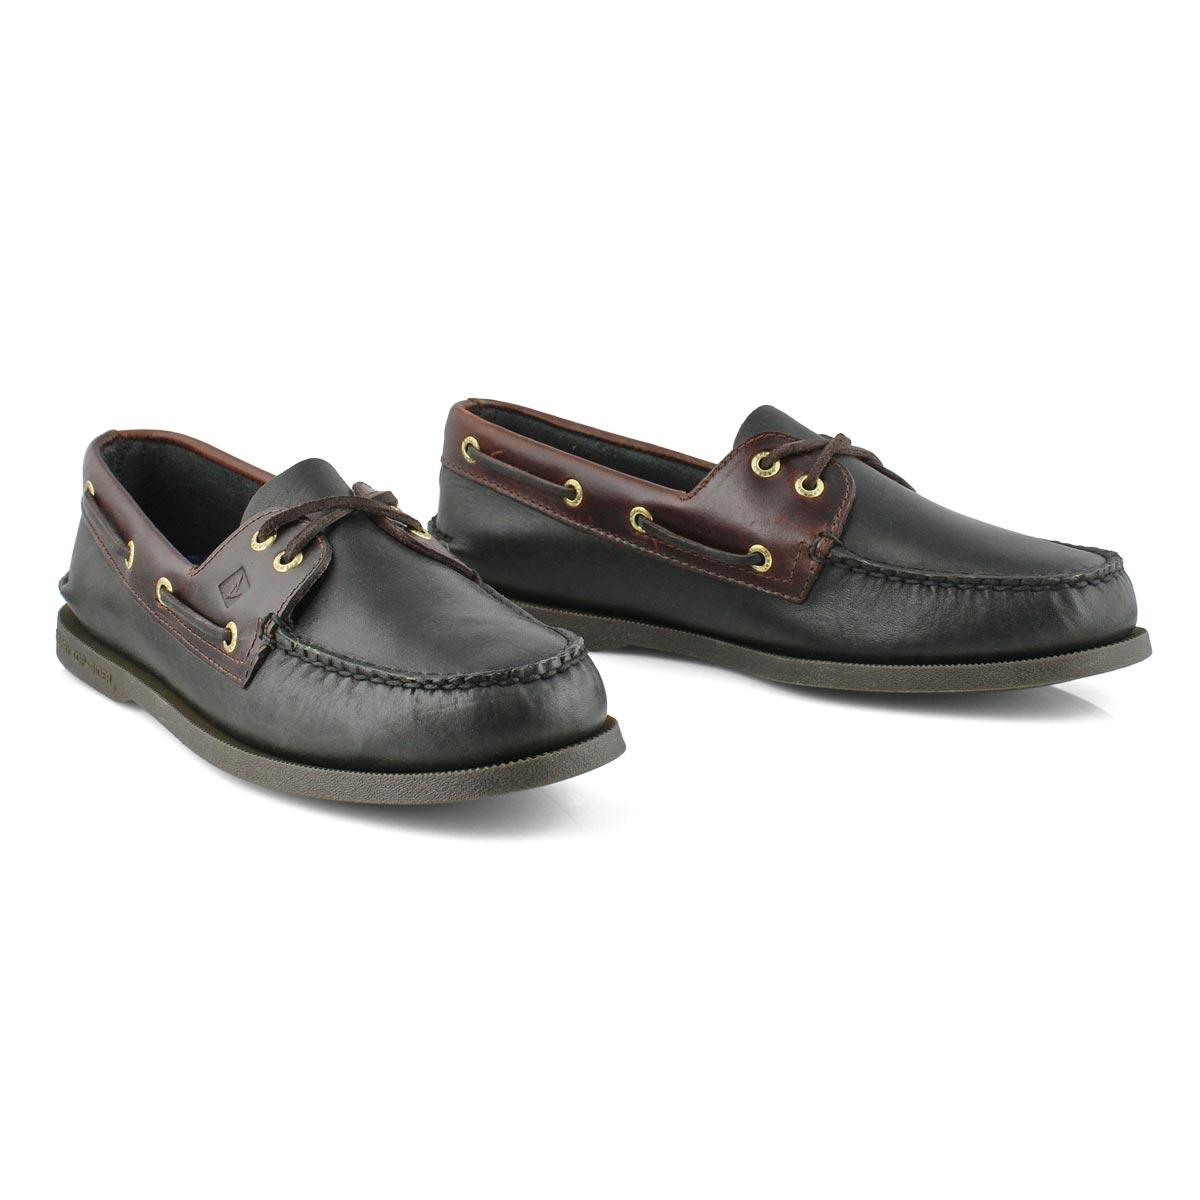 Men's AUTHENTIC ORIGINAL black/amaretto boat shoes